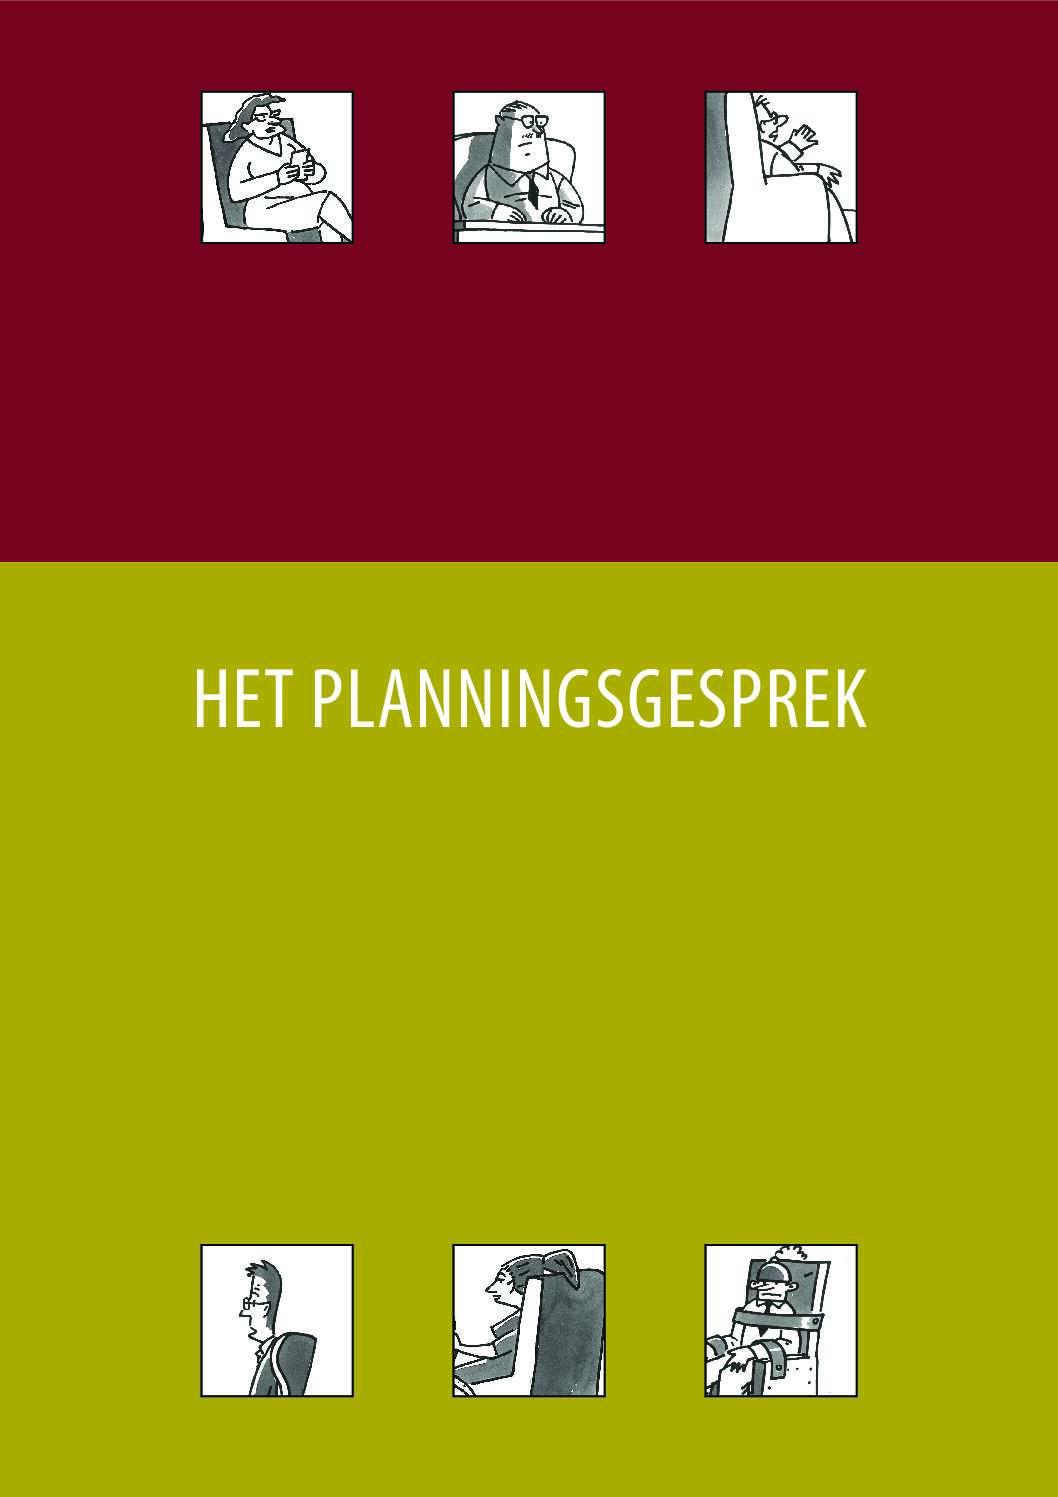 Handleiding planningsgesprek